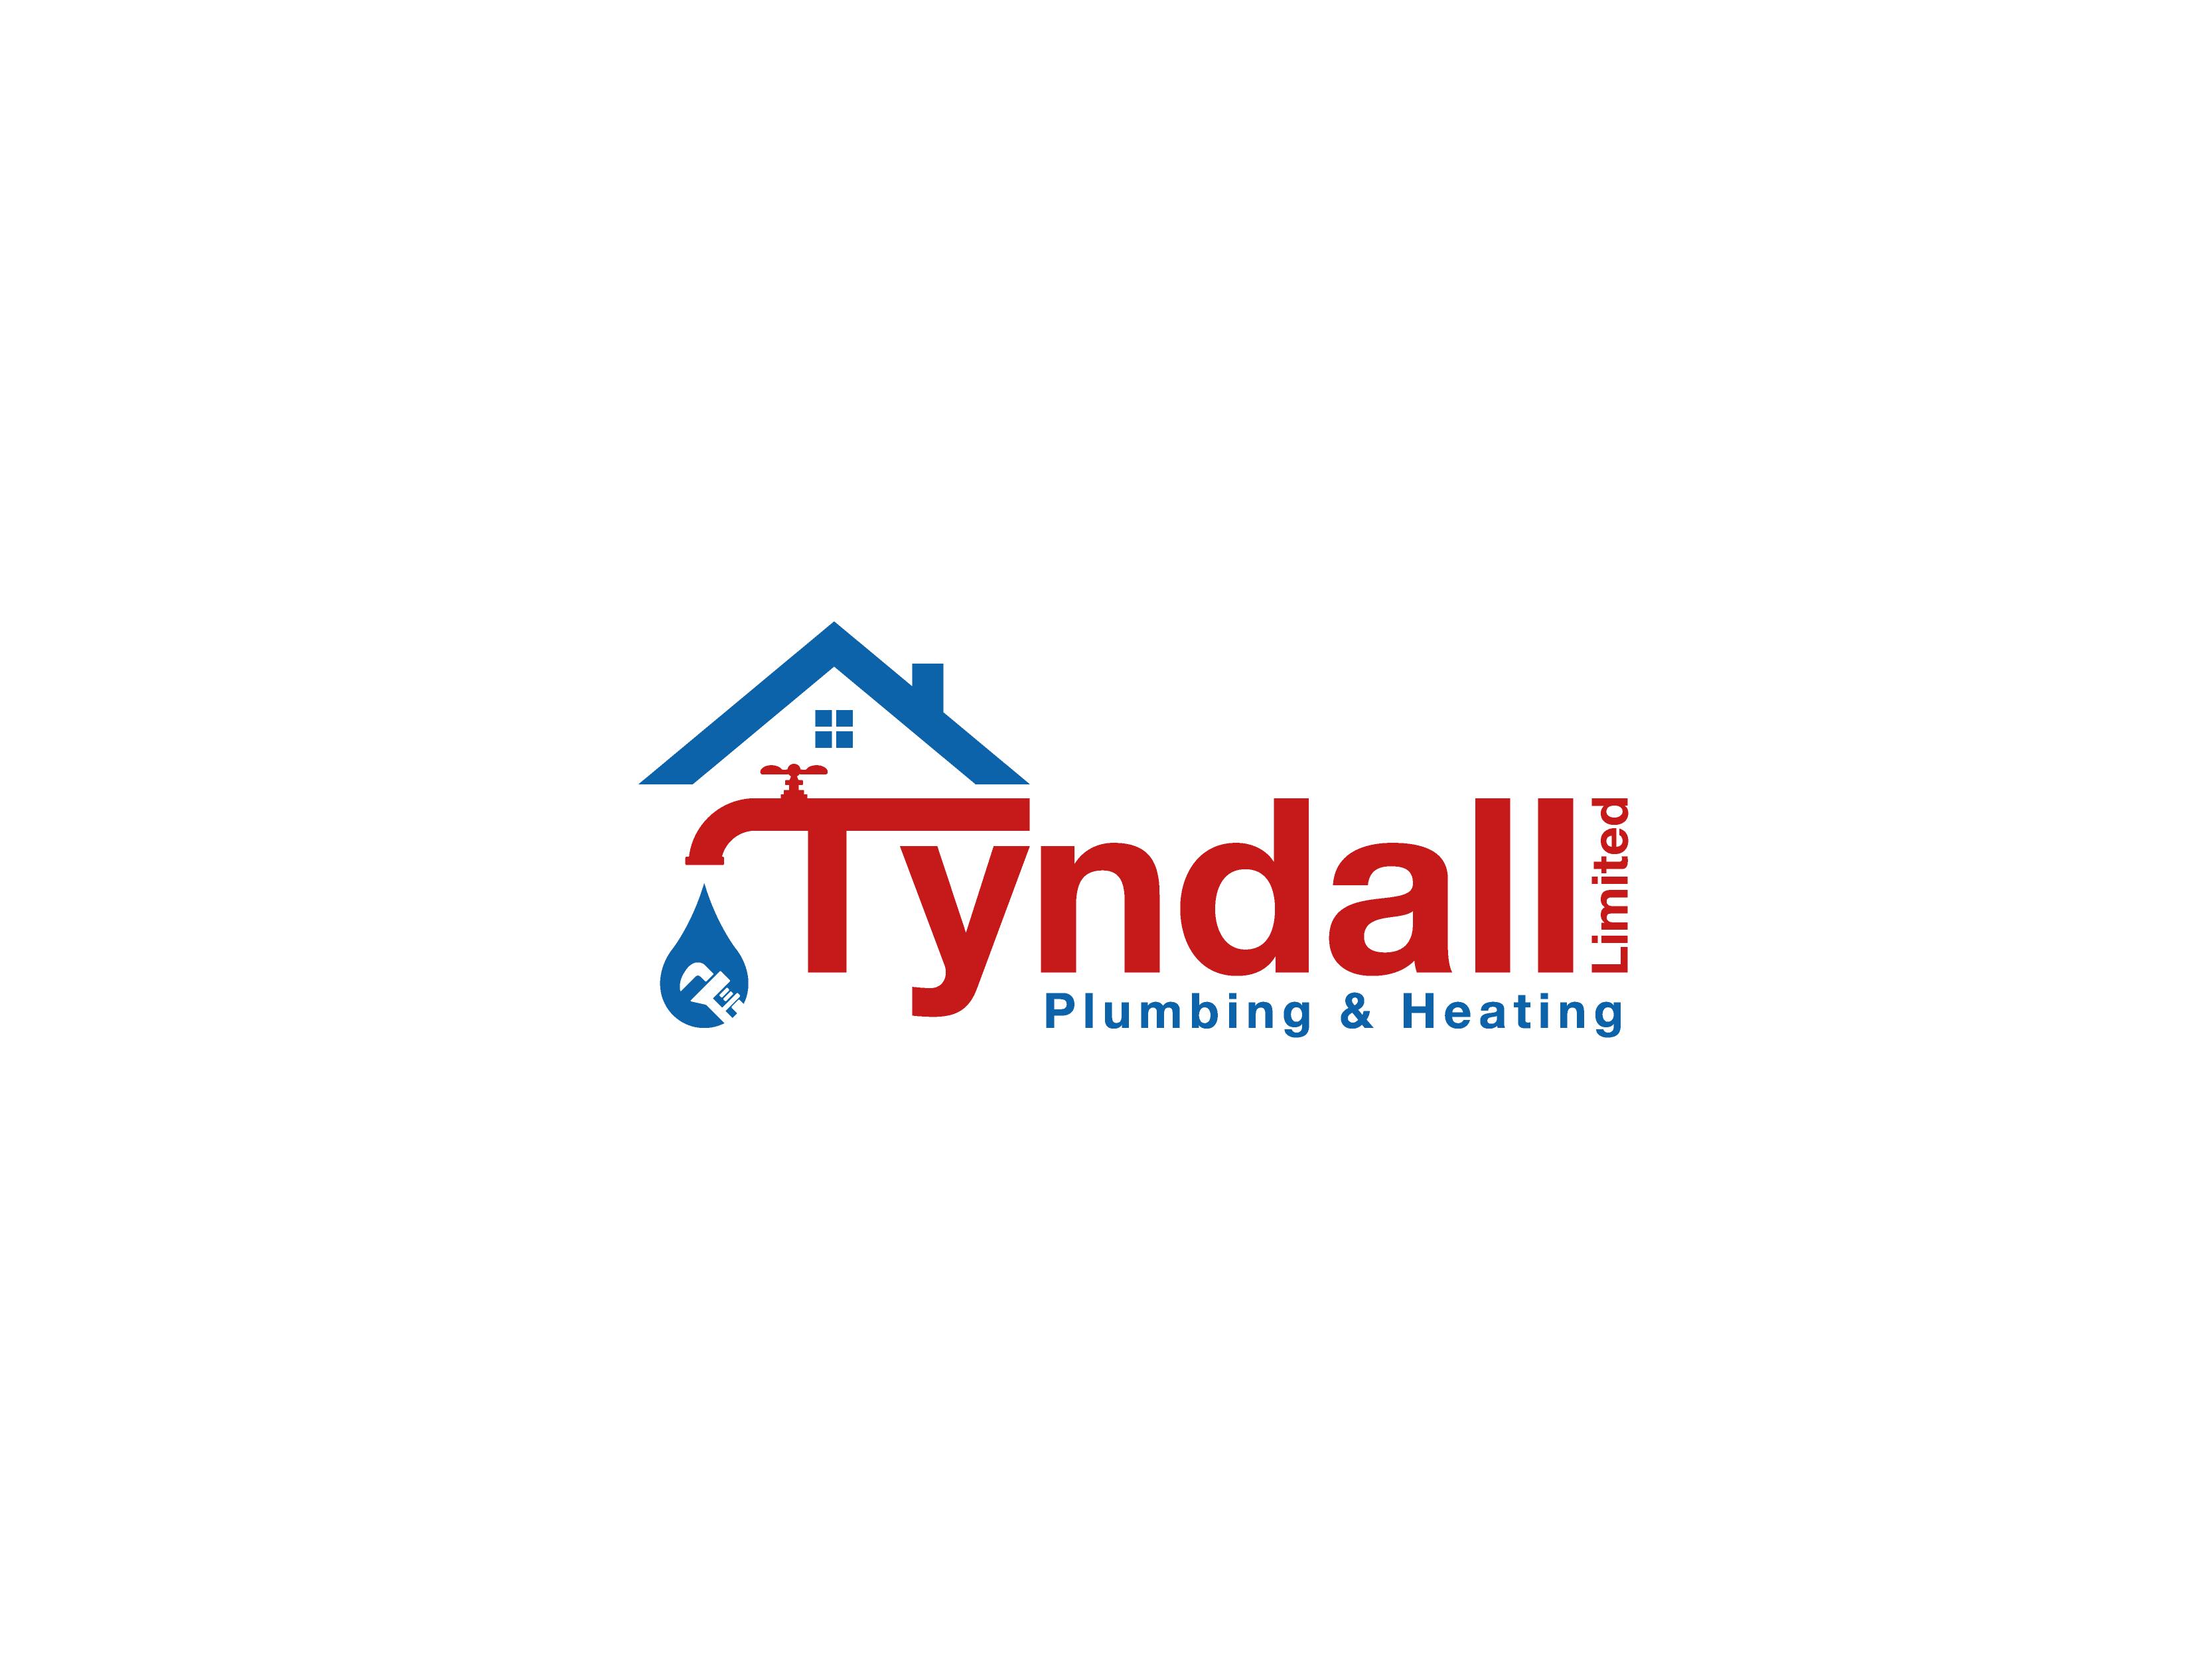 Logo Design by Shivaprasad Sangondimath - Entry No. 87 in the Logo Design Contest Imaginative Logo Design for Tyndall Plumbing & Heating.